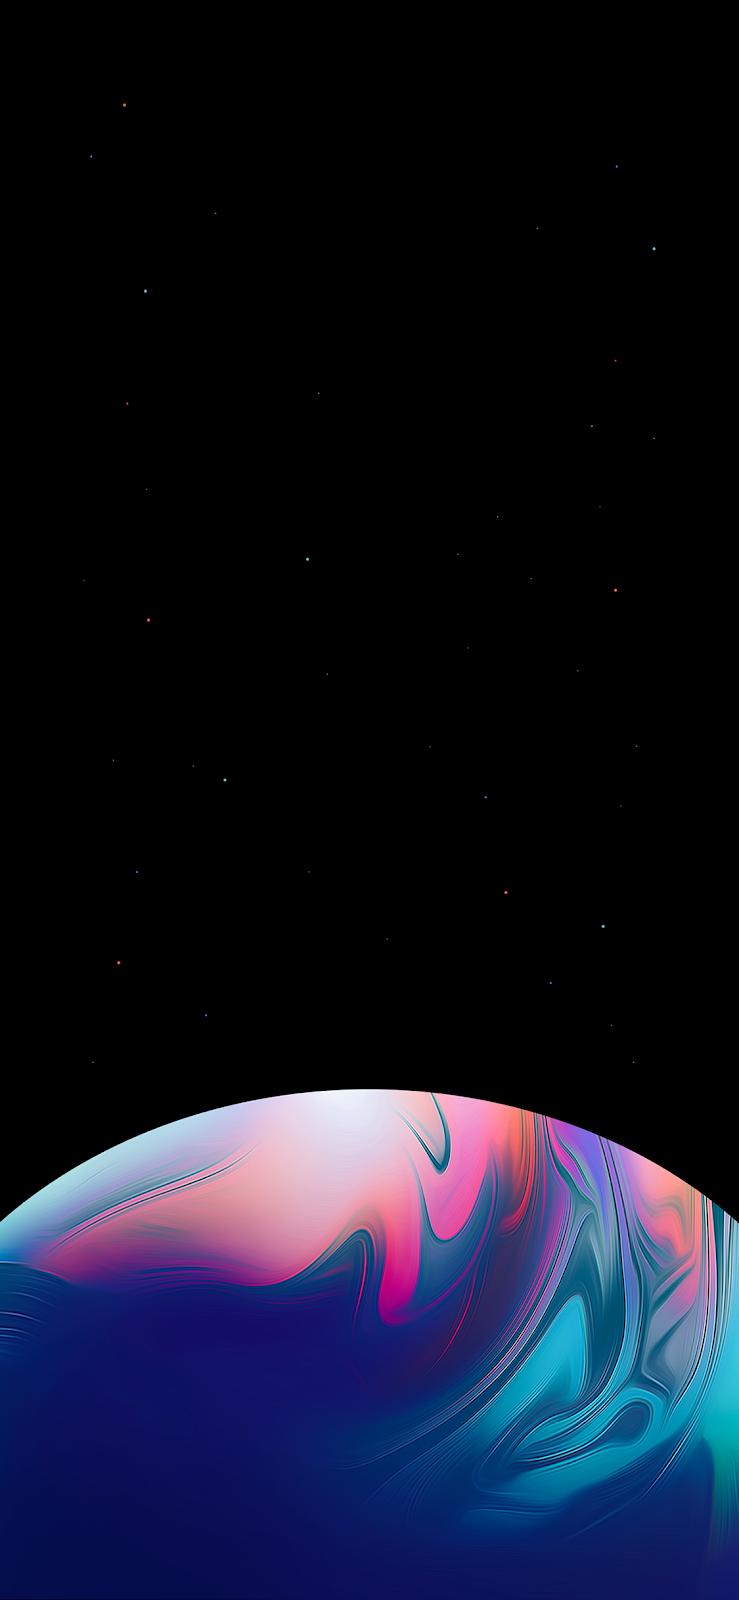 Sfondi iphone x mondo